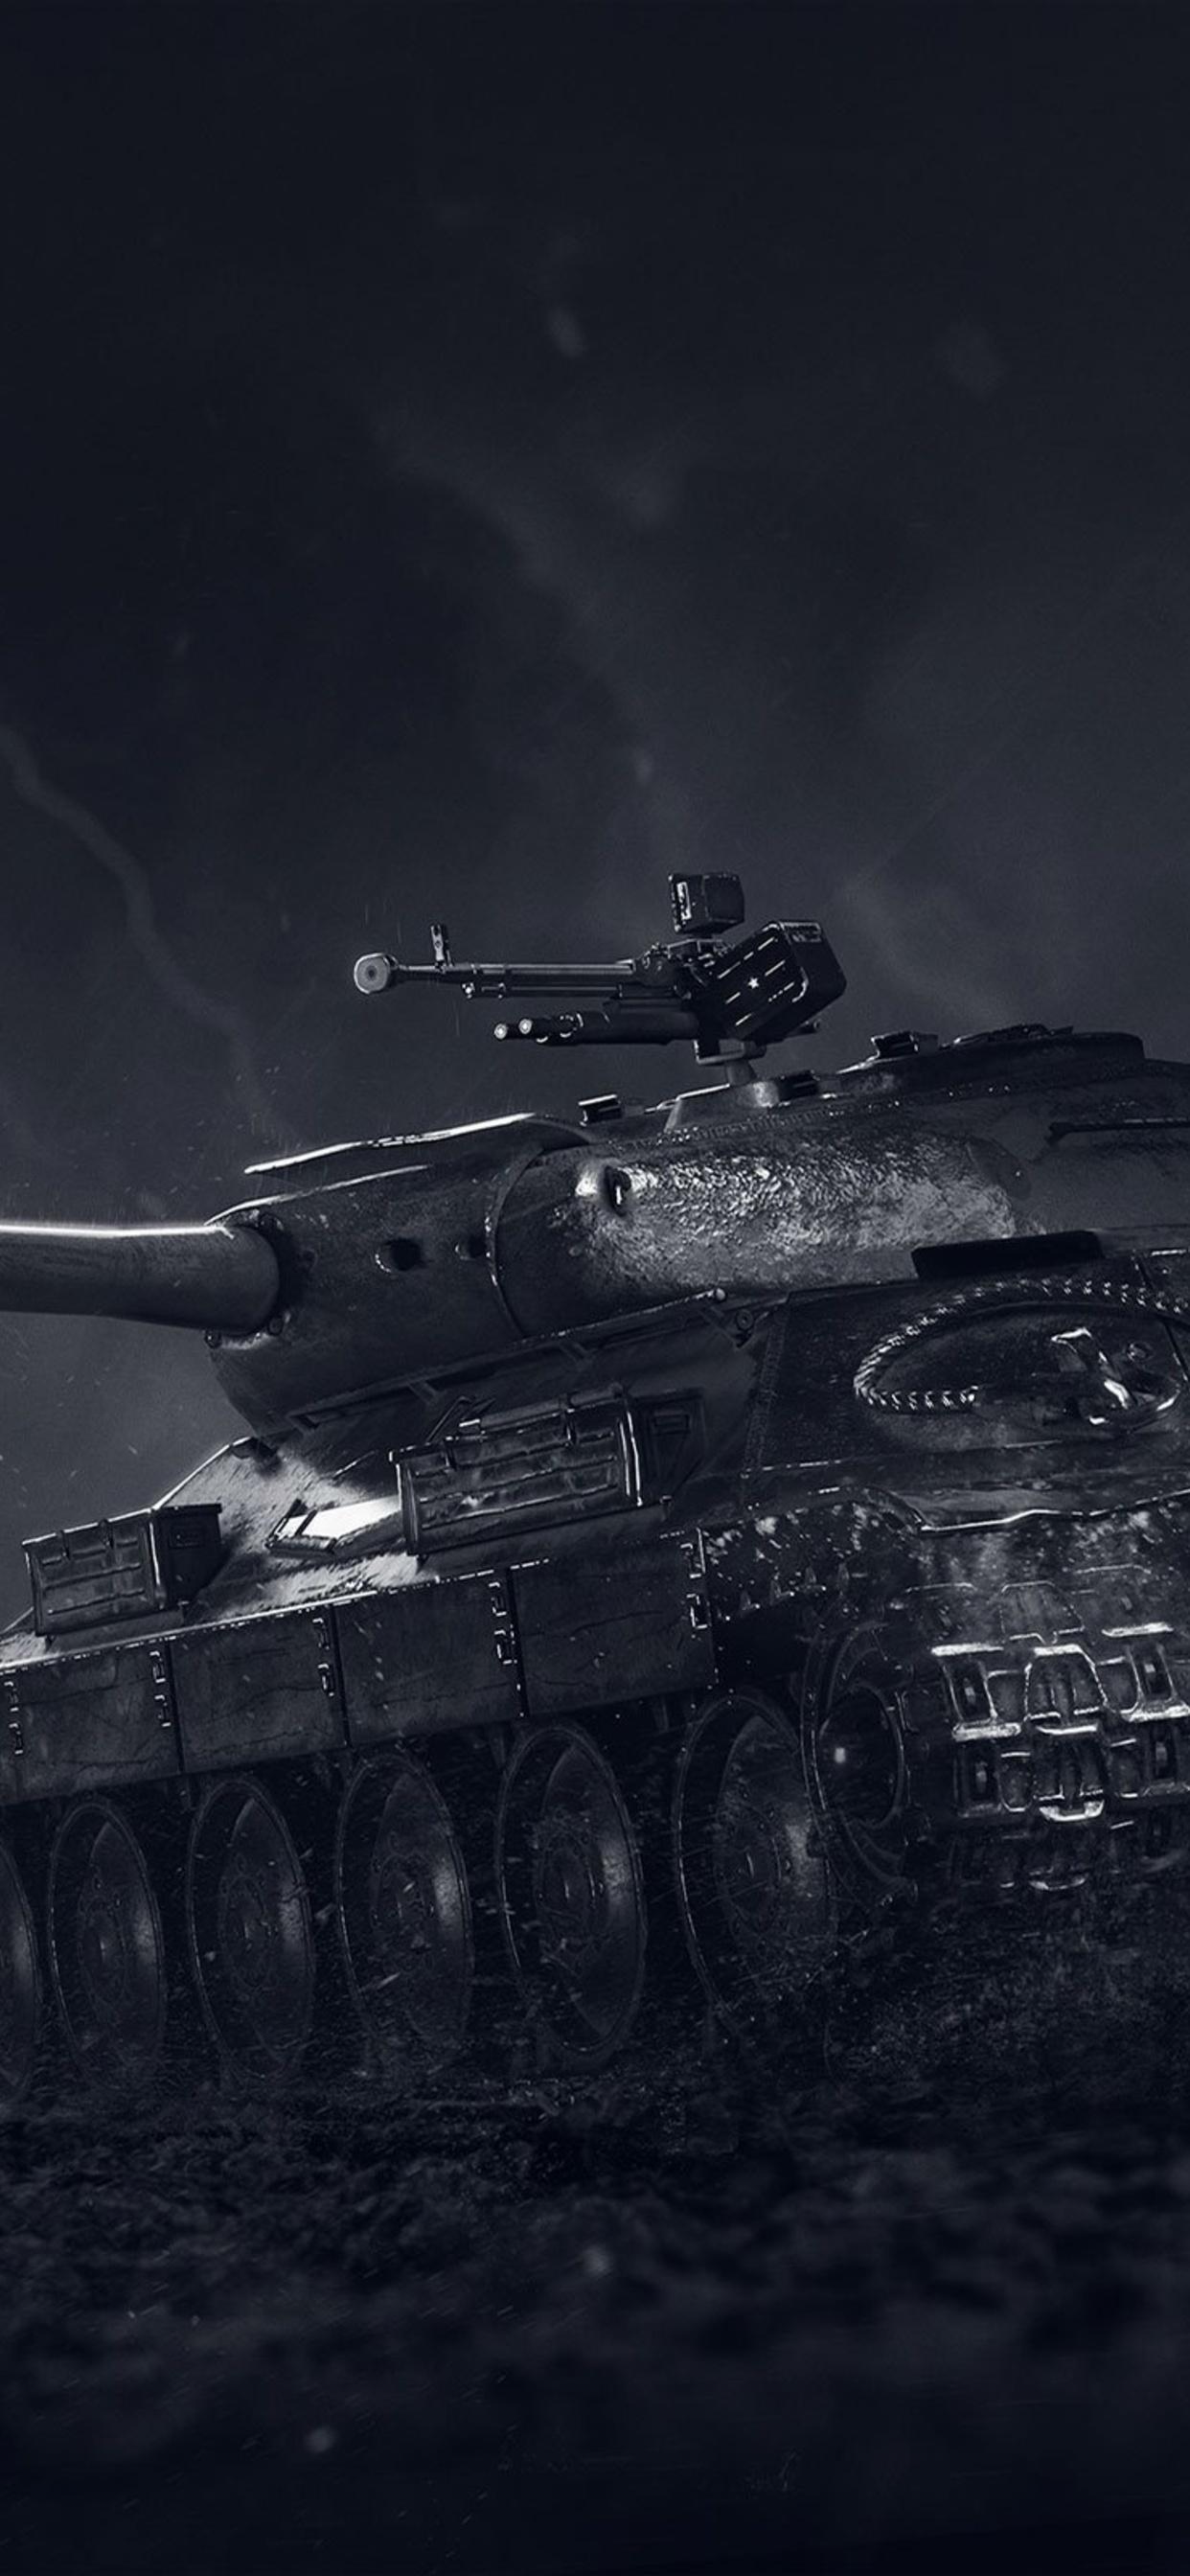 1242x2688 World Of Tanks Game Hd Iphone Xs Max Hd 4k